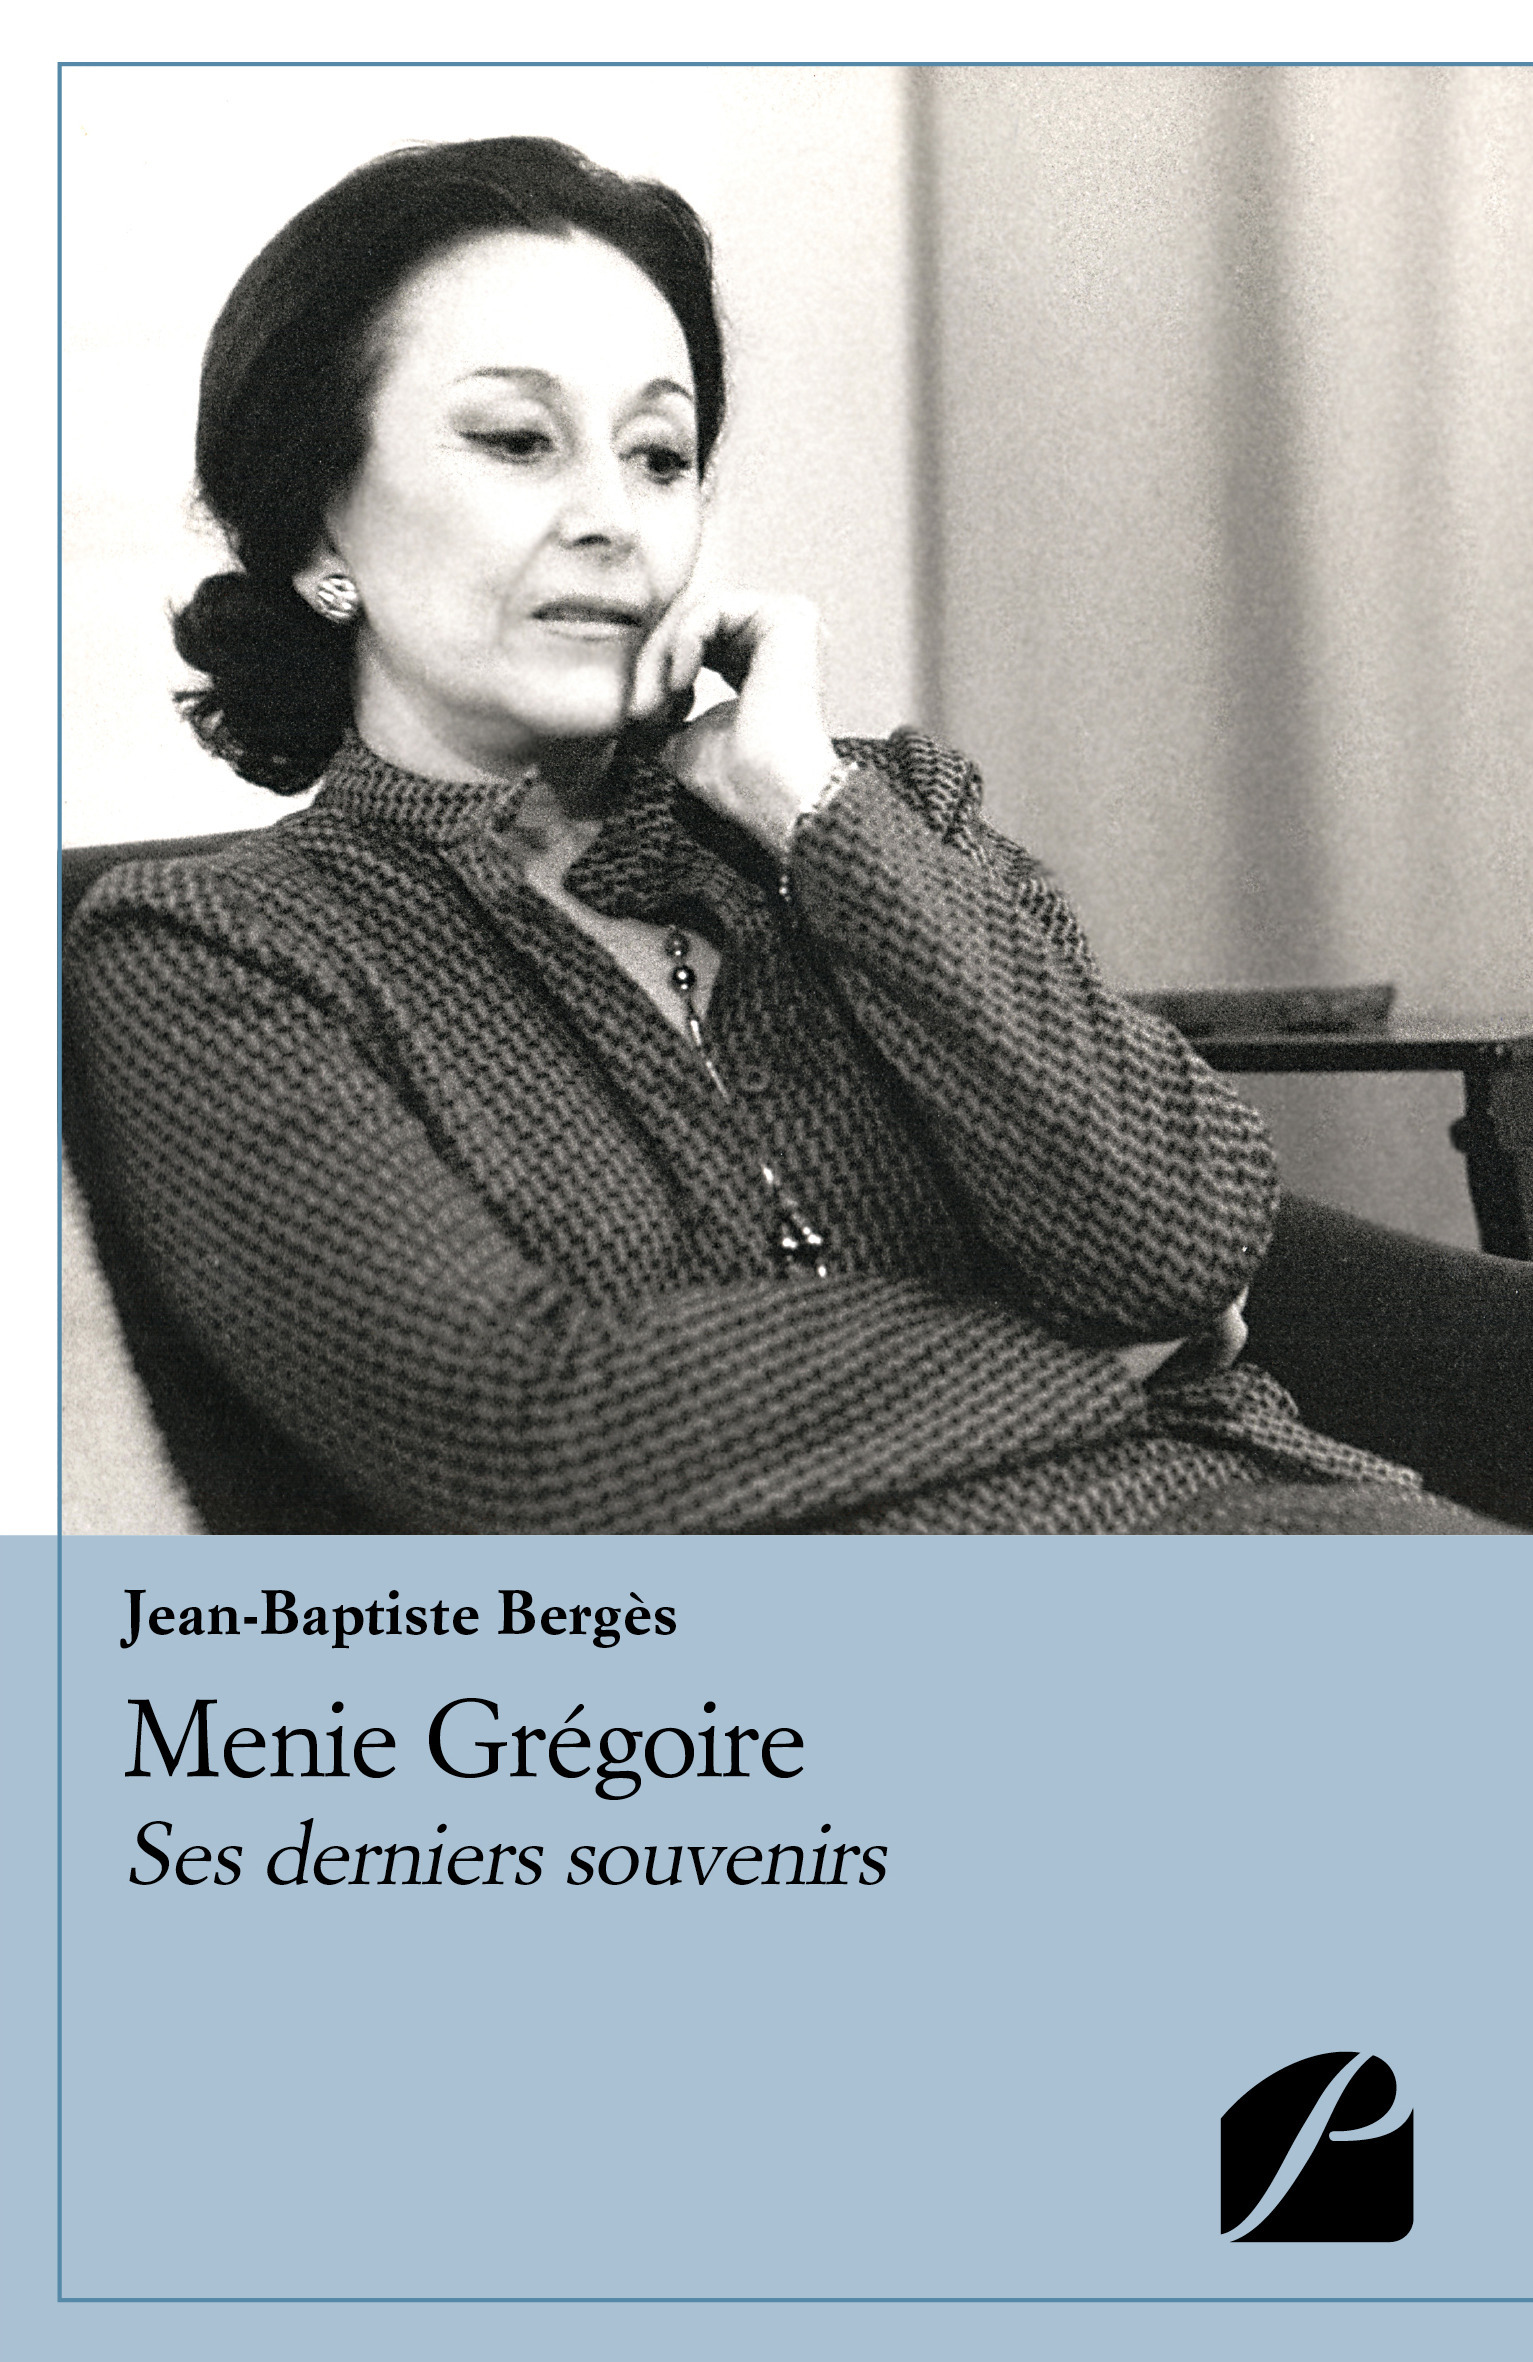 Menie Grégoire